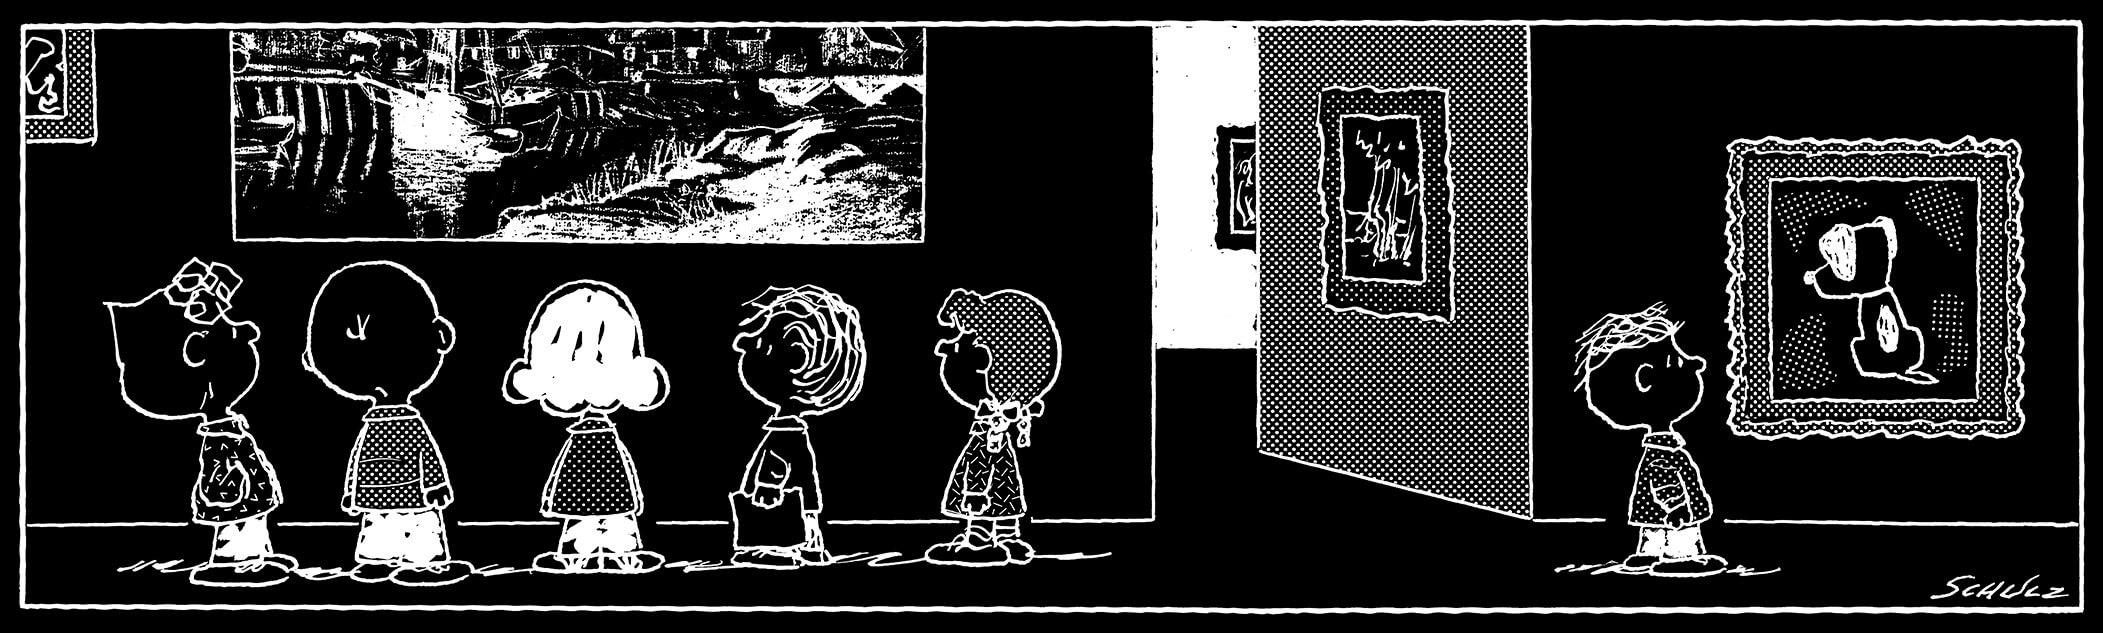 http://www.peanutsglobalartistcollective.com/static/img/gac-comic-strip.jpg